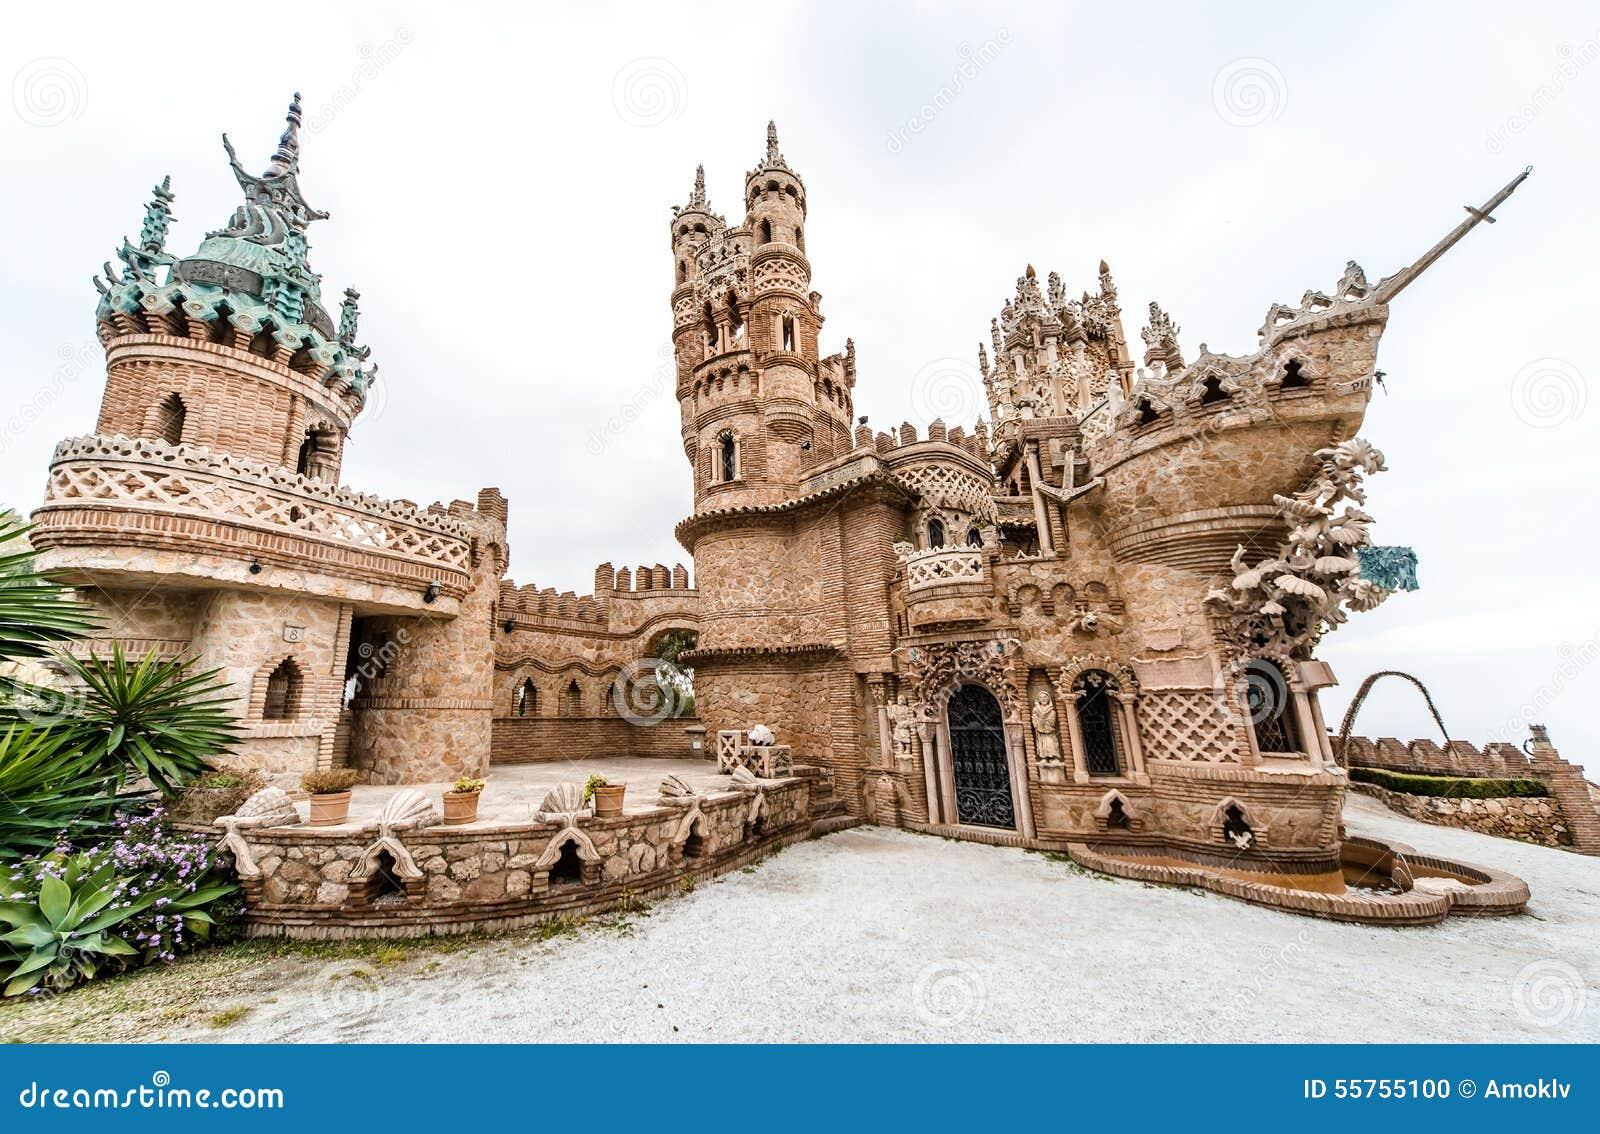 ... Christopher Columbus. Benalmadena town. Province of Malaga. Andalusia